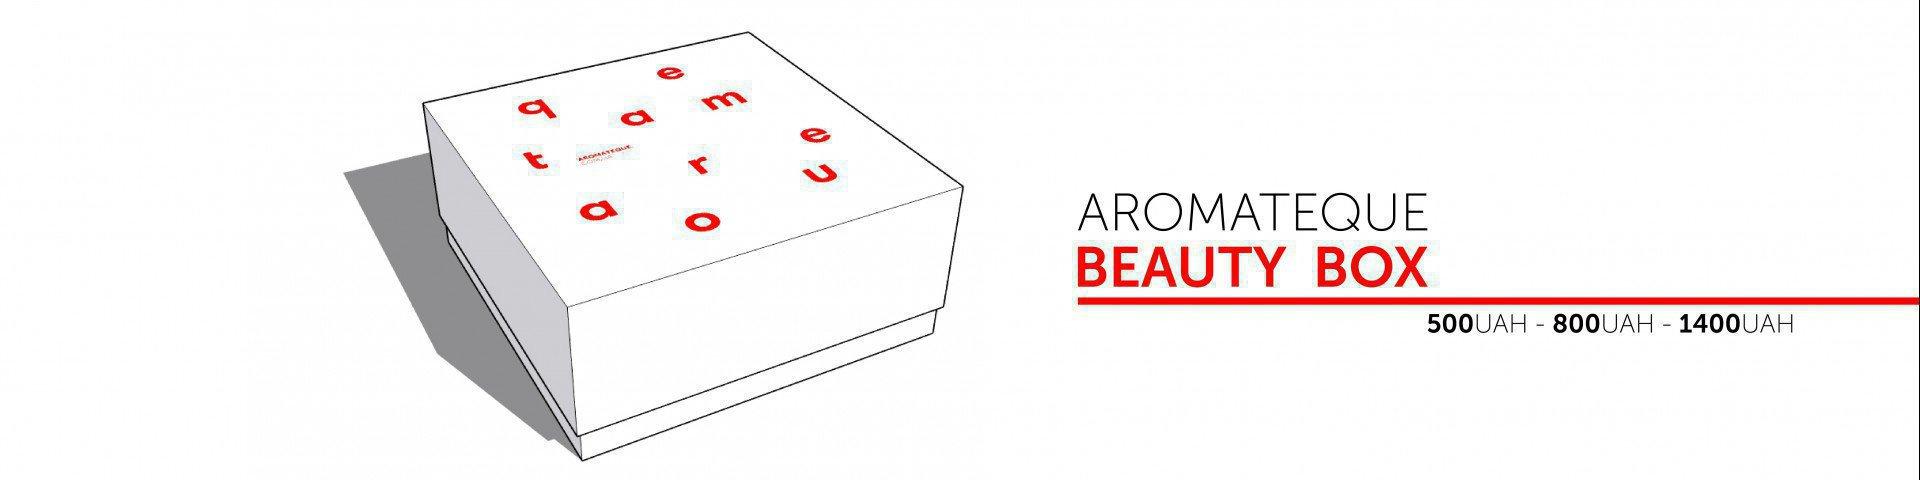 Aromateque BeautyBox